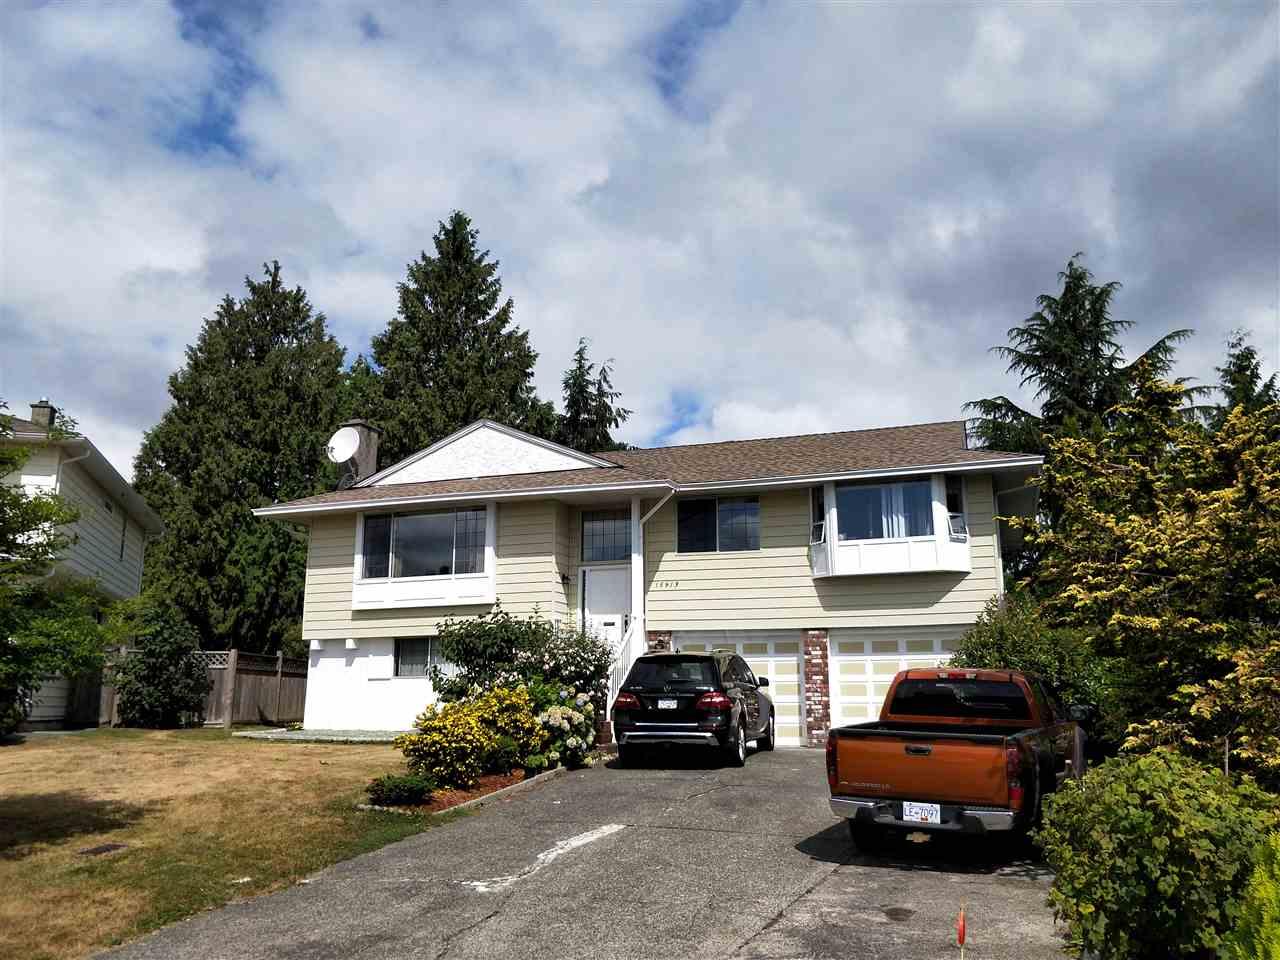 Detached at 15913 100A AVENUE, North Surrey, British Columbia. Image 1